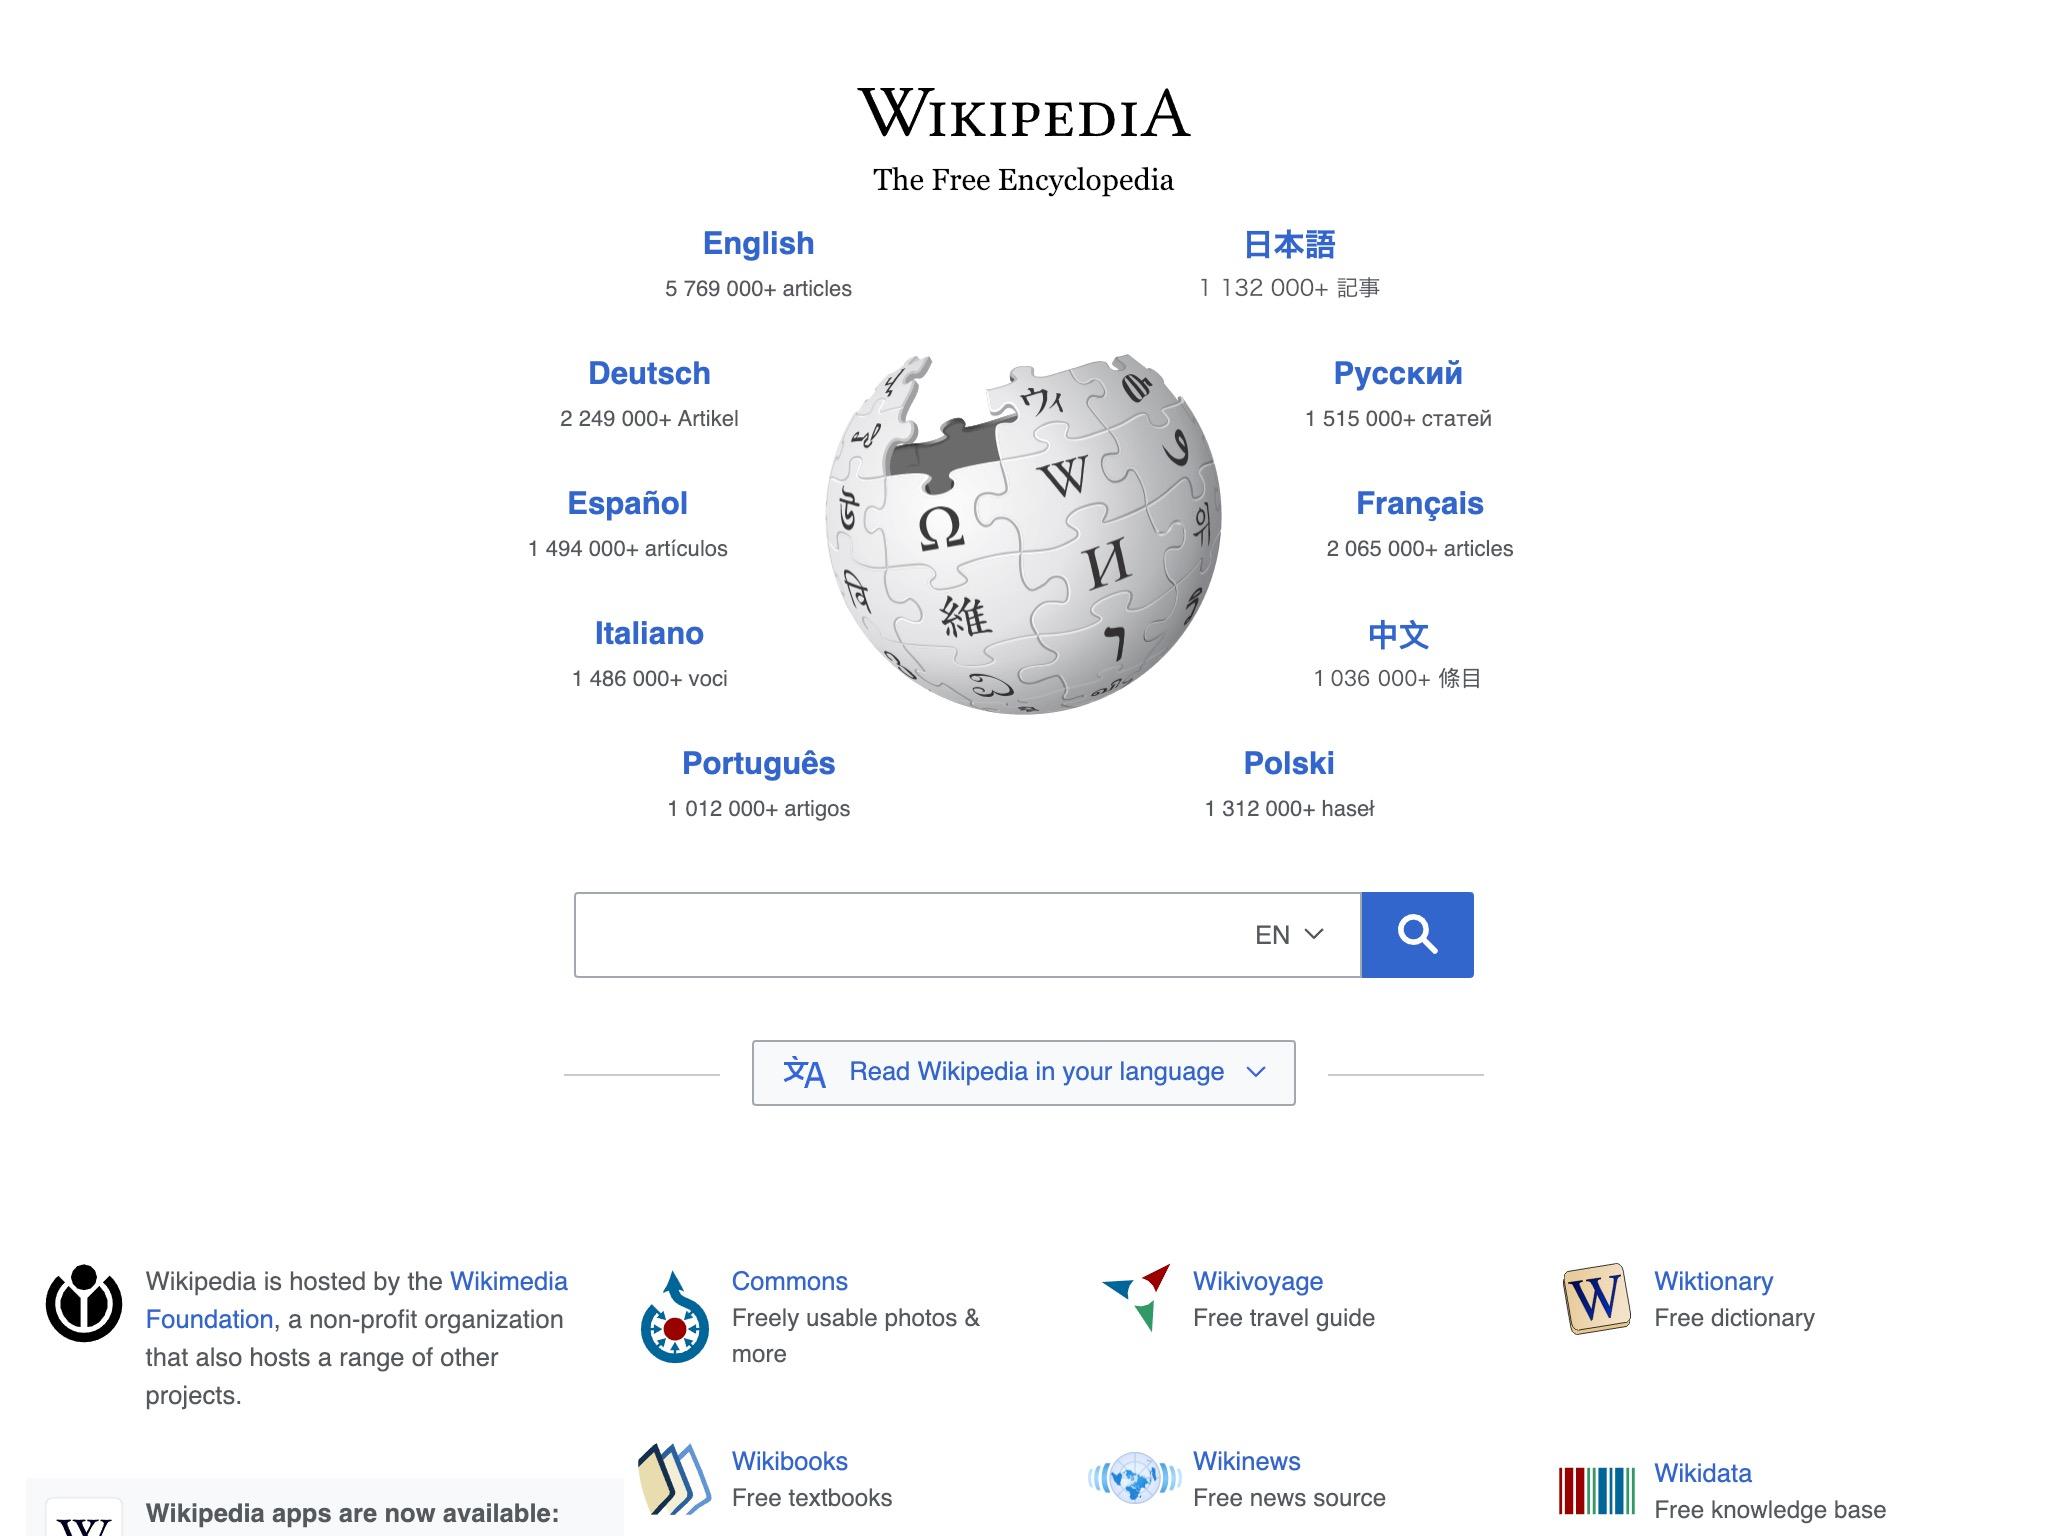 wikipedia_2019.jpg